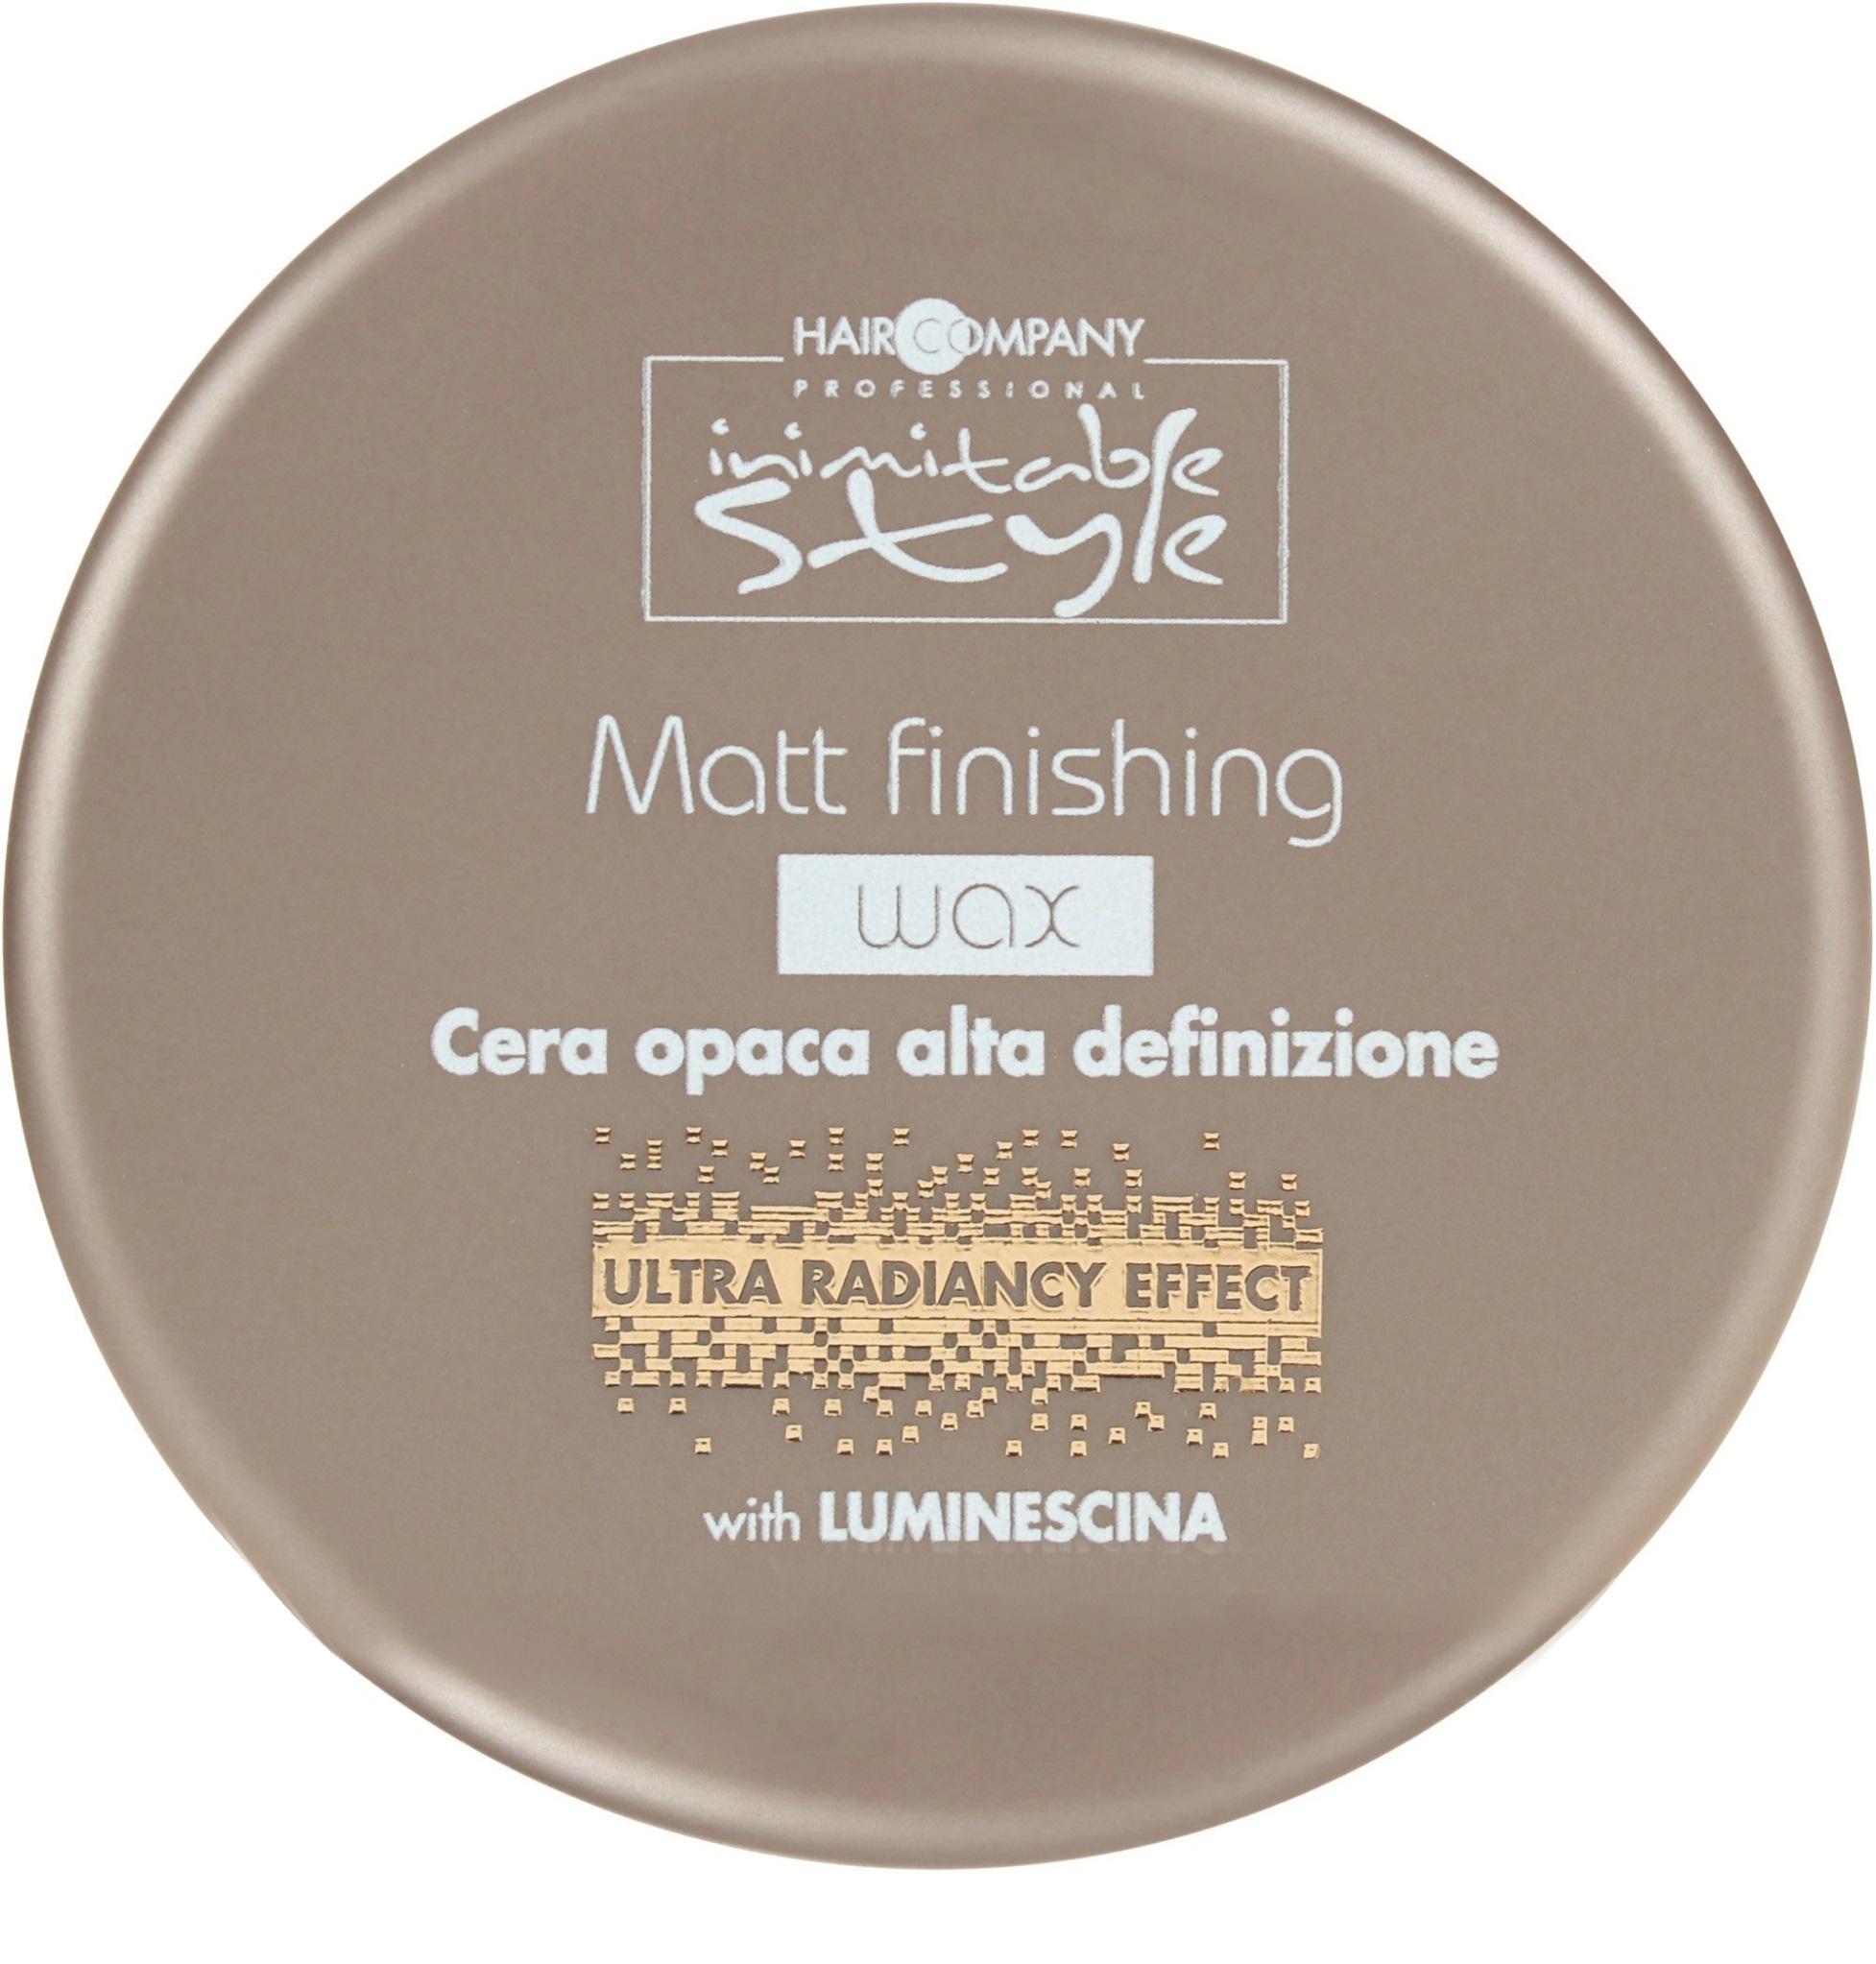 HAIR COMPANY Воск завершающий с матовым эффектом / INIMITABLE STYLE Matt Finishing Wax 100 мл